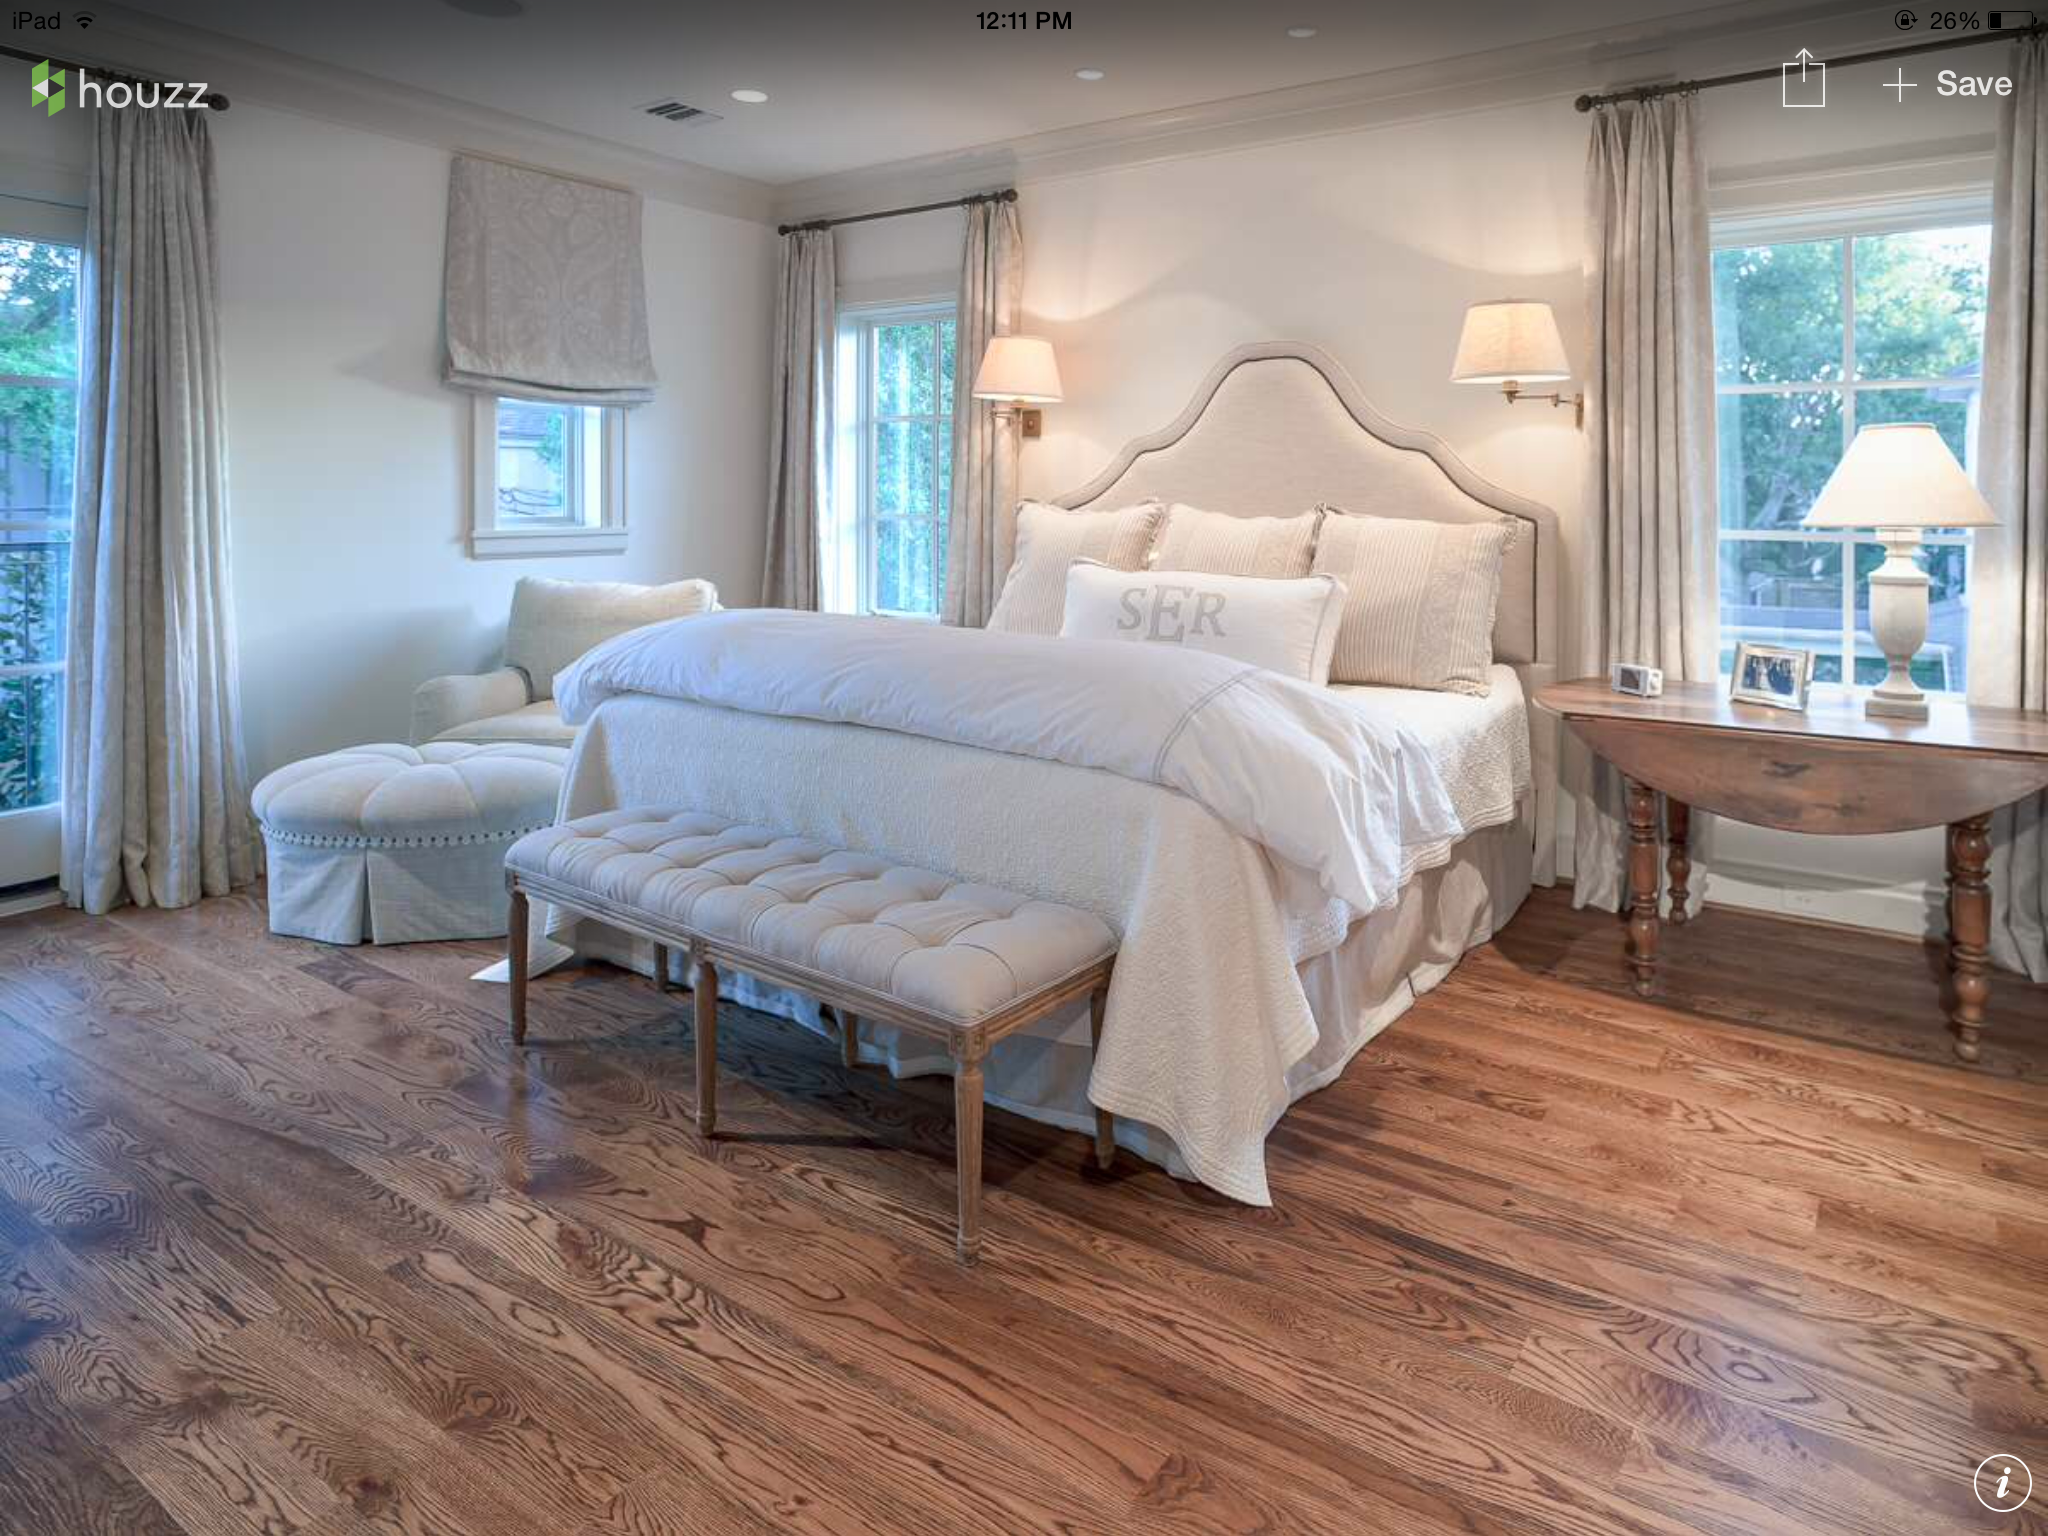 Bed head against window  pin by mica dicken on bedroom  pinterest  bedrooms master bedroom